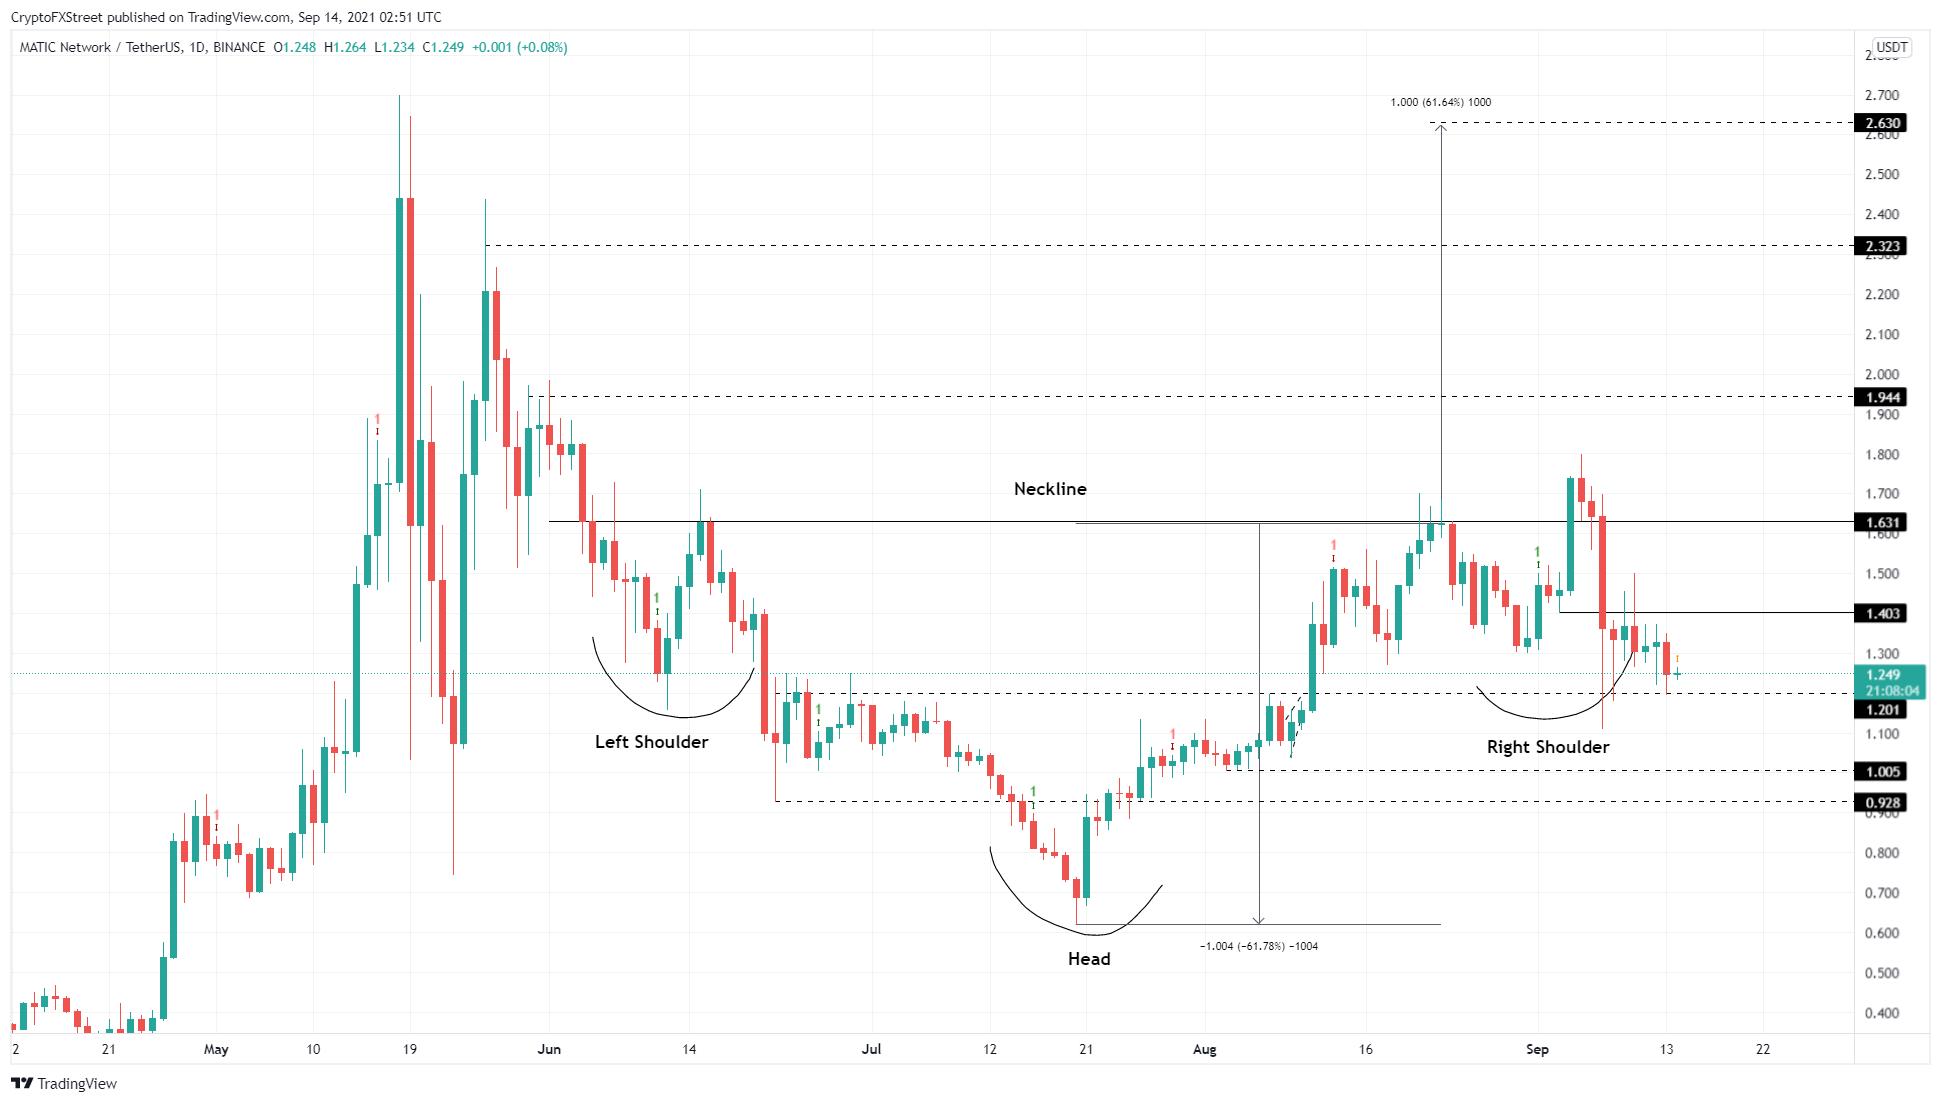 MATIC/USDT 1-day chart